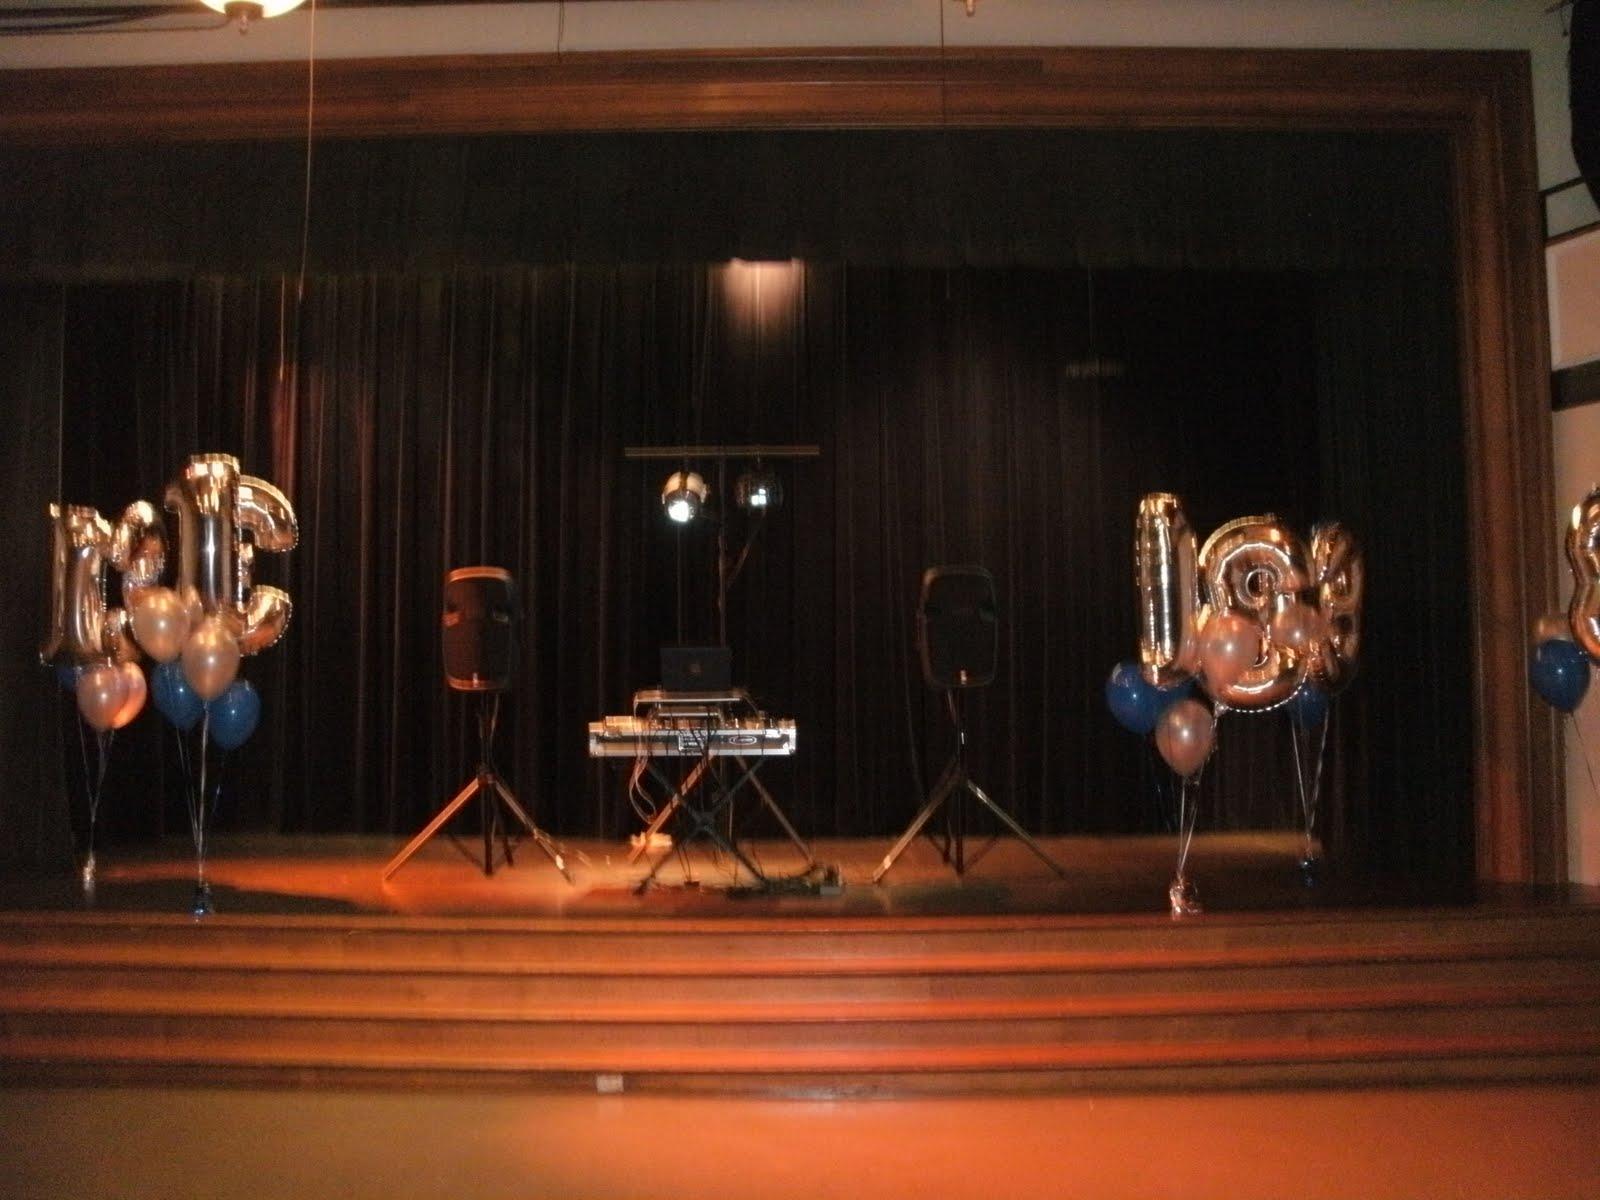 Koz Mobil Dj Events Karen Larson 13th Bday Party